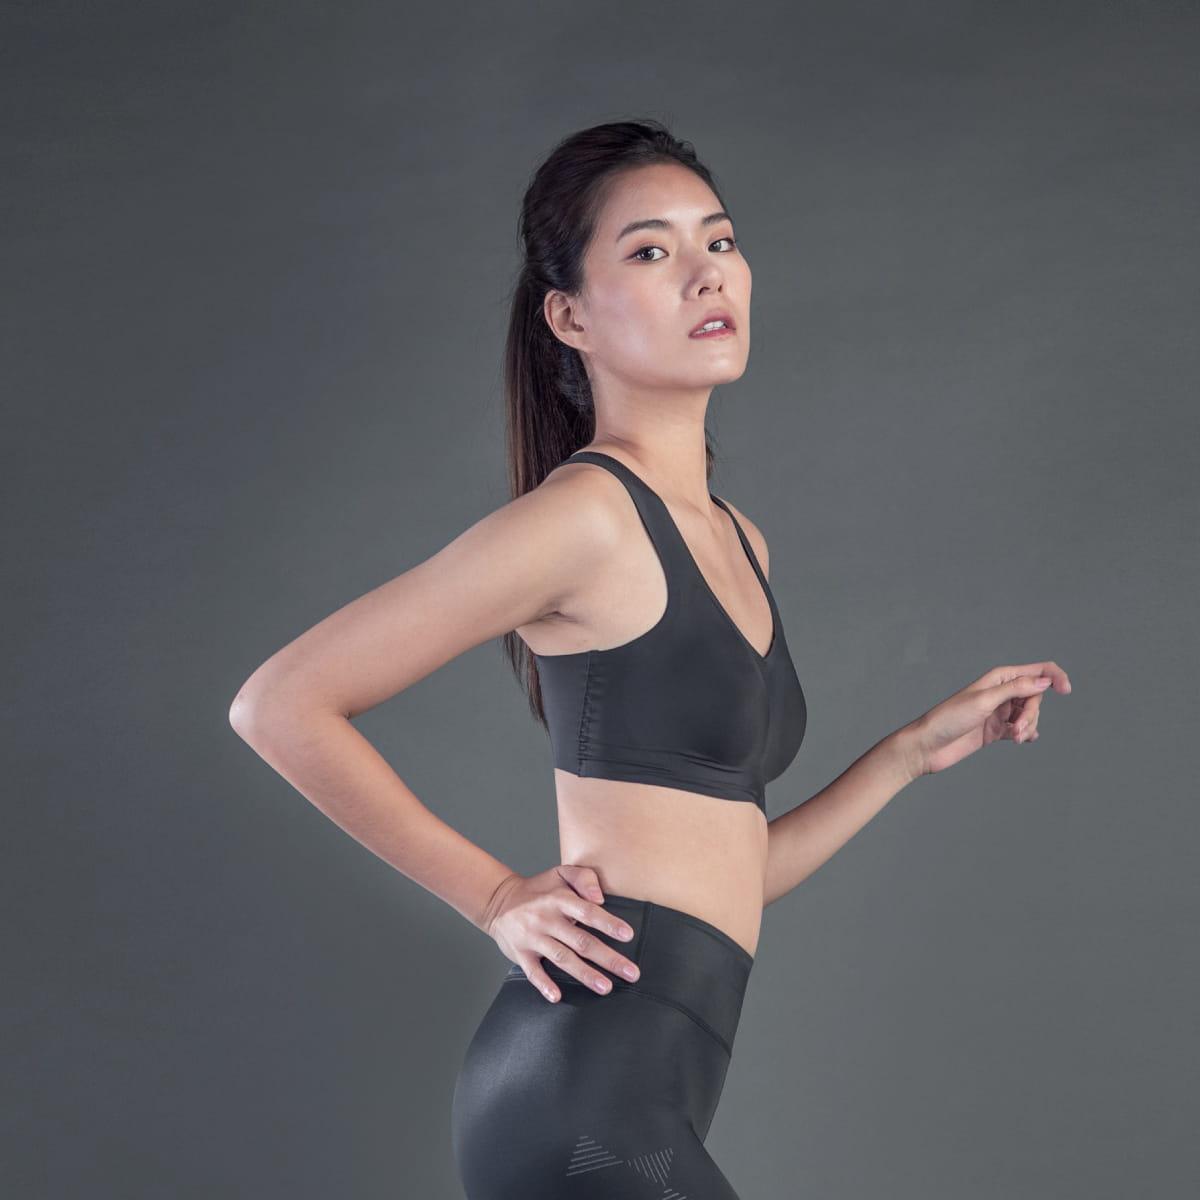 TENO超彈感美型健身褲-Mountain山稜 11